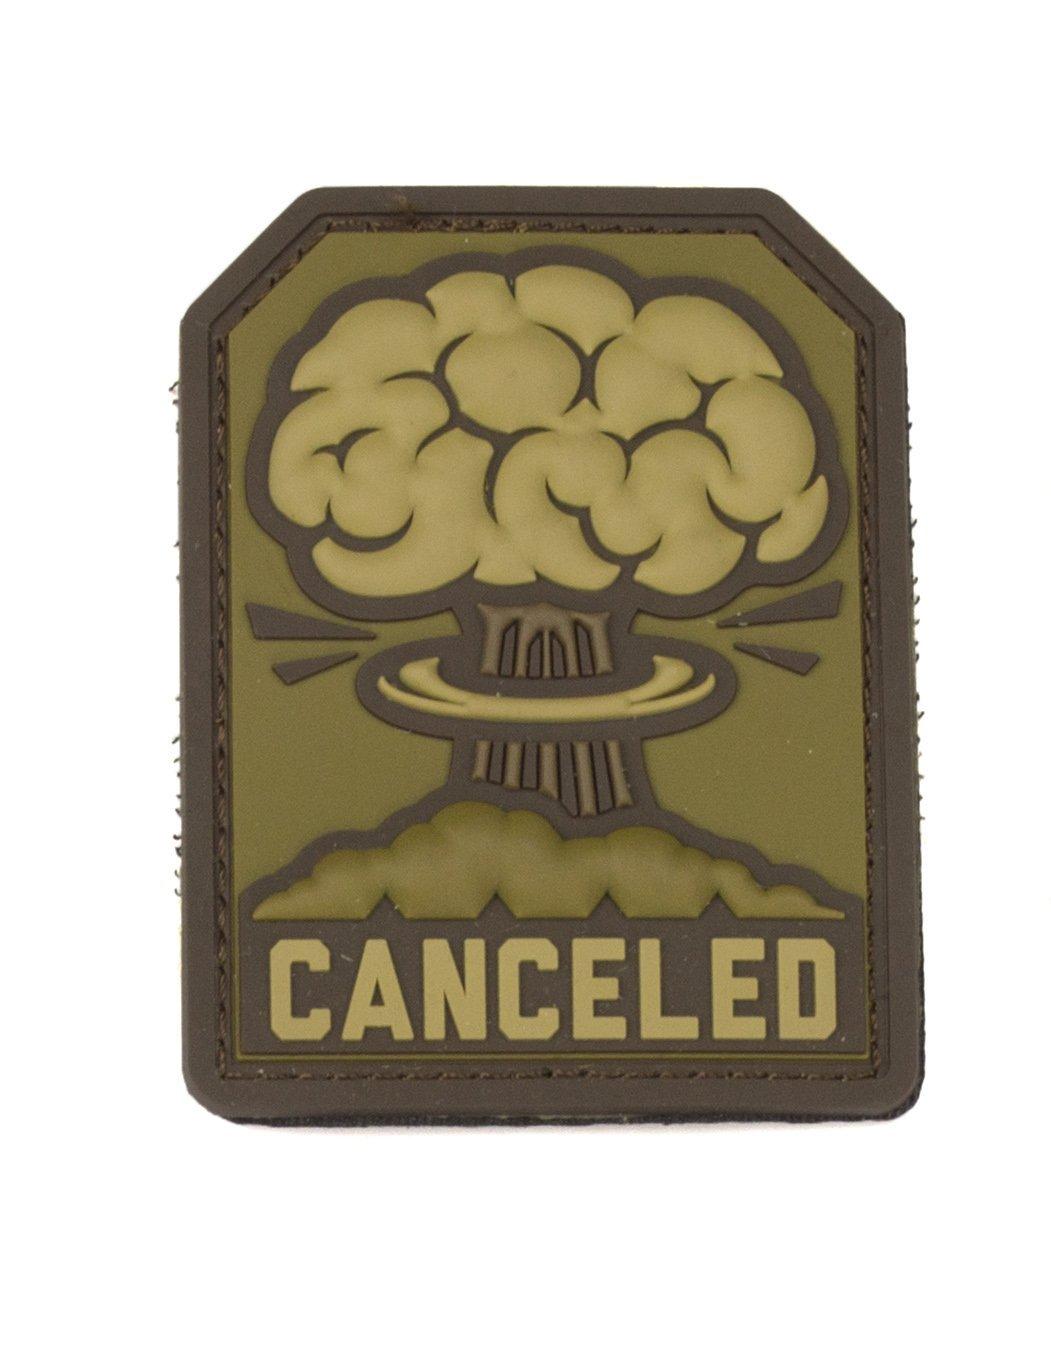 Mil-Spec Monkey Canceled PVC